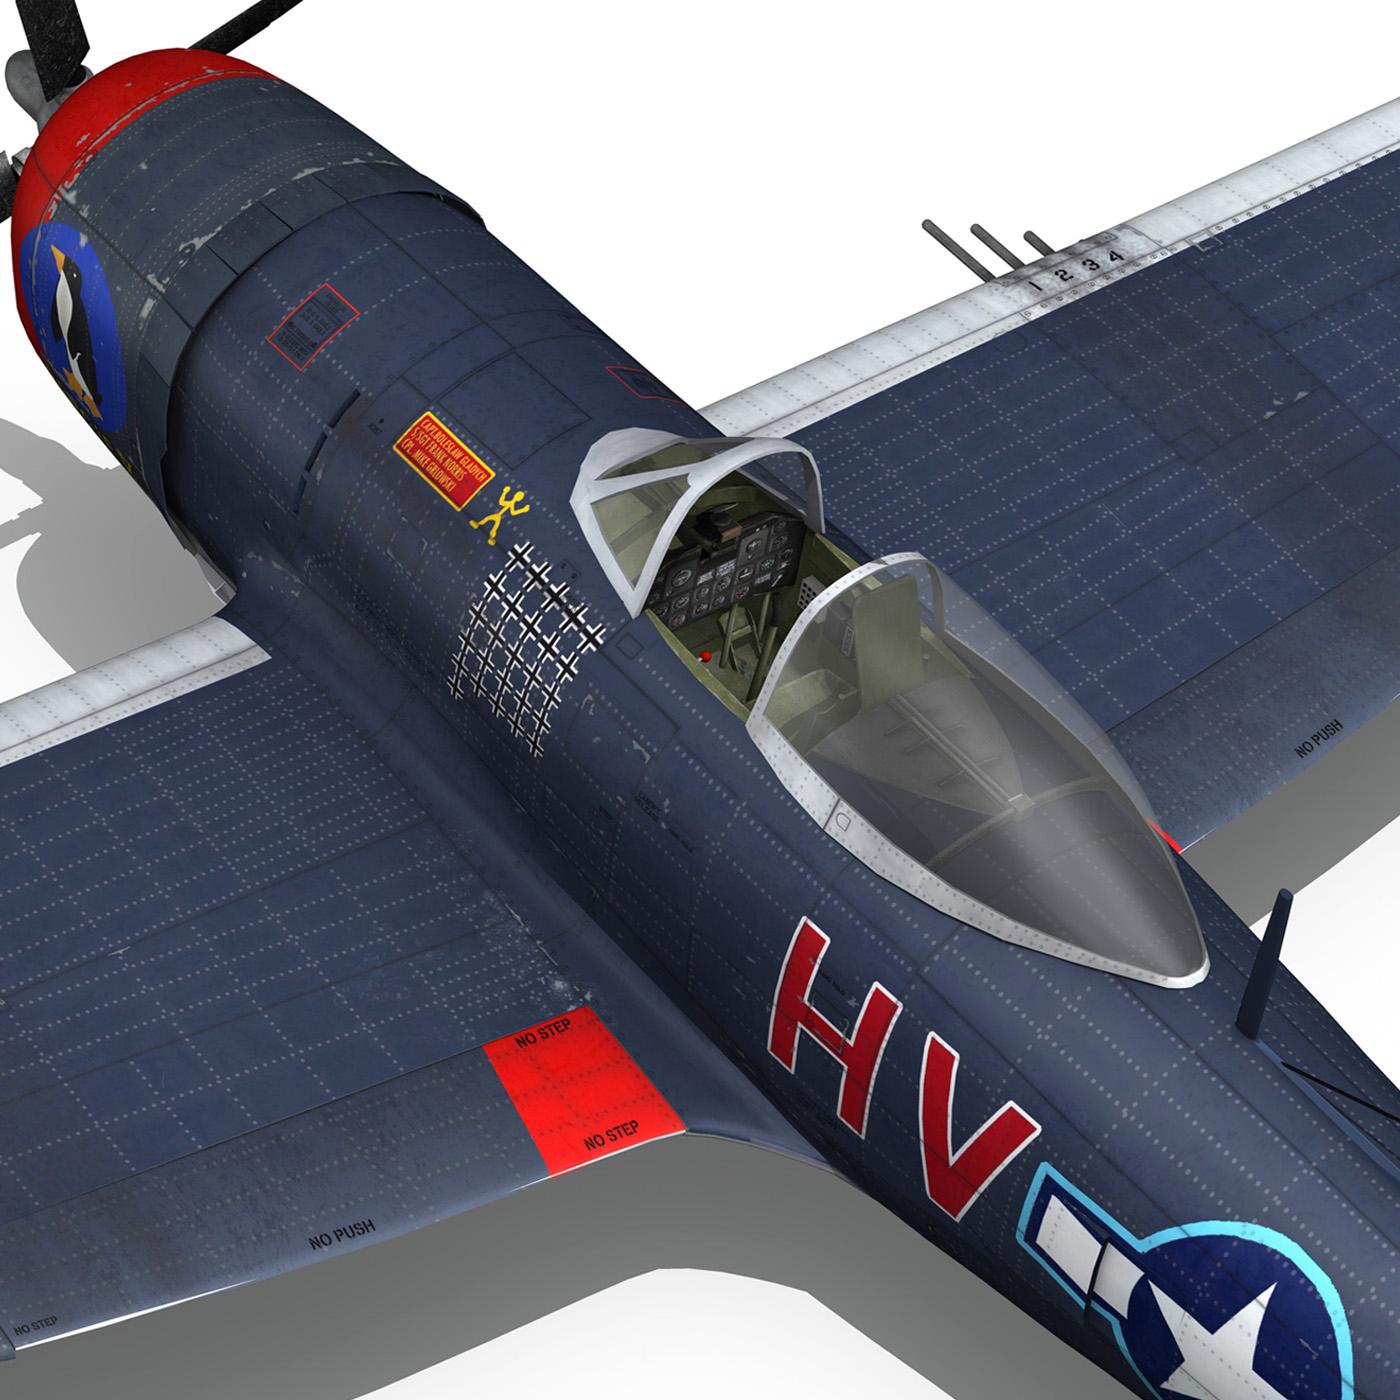 republic p-47m thunderbolt – pengie v 3d model 3ds c4d fbx lwo lw lws obj 279732